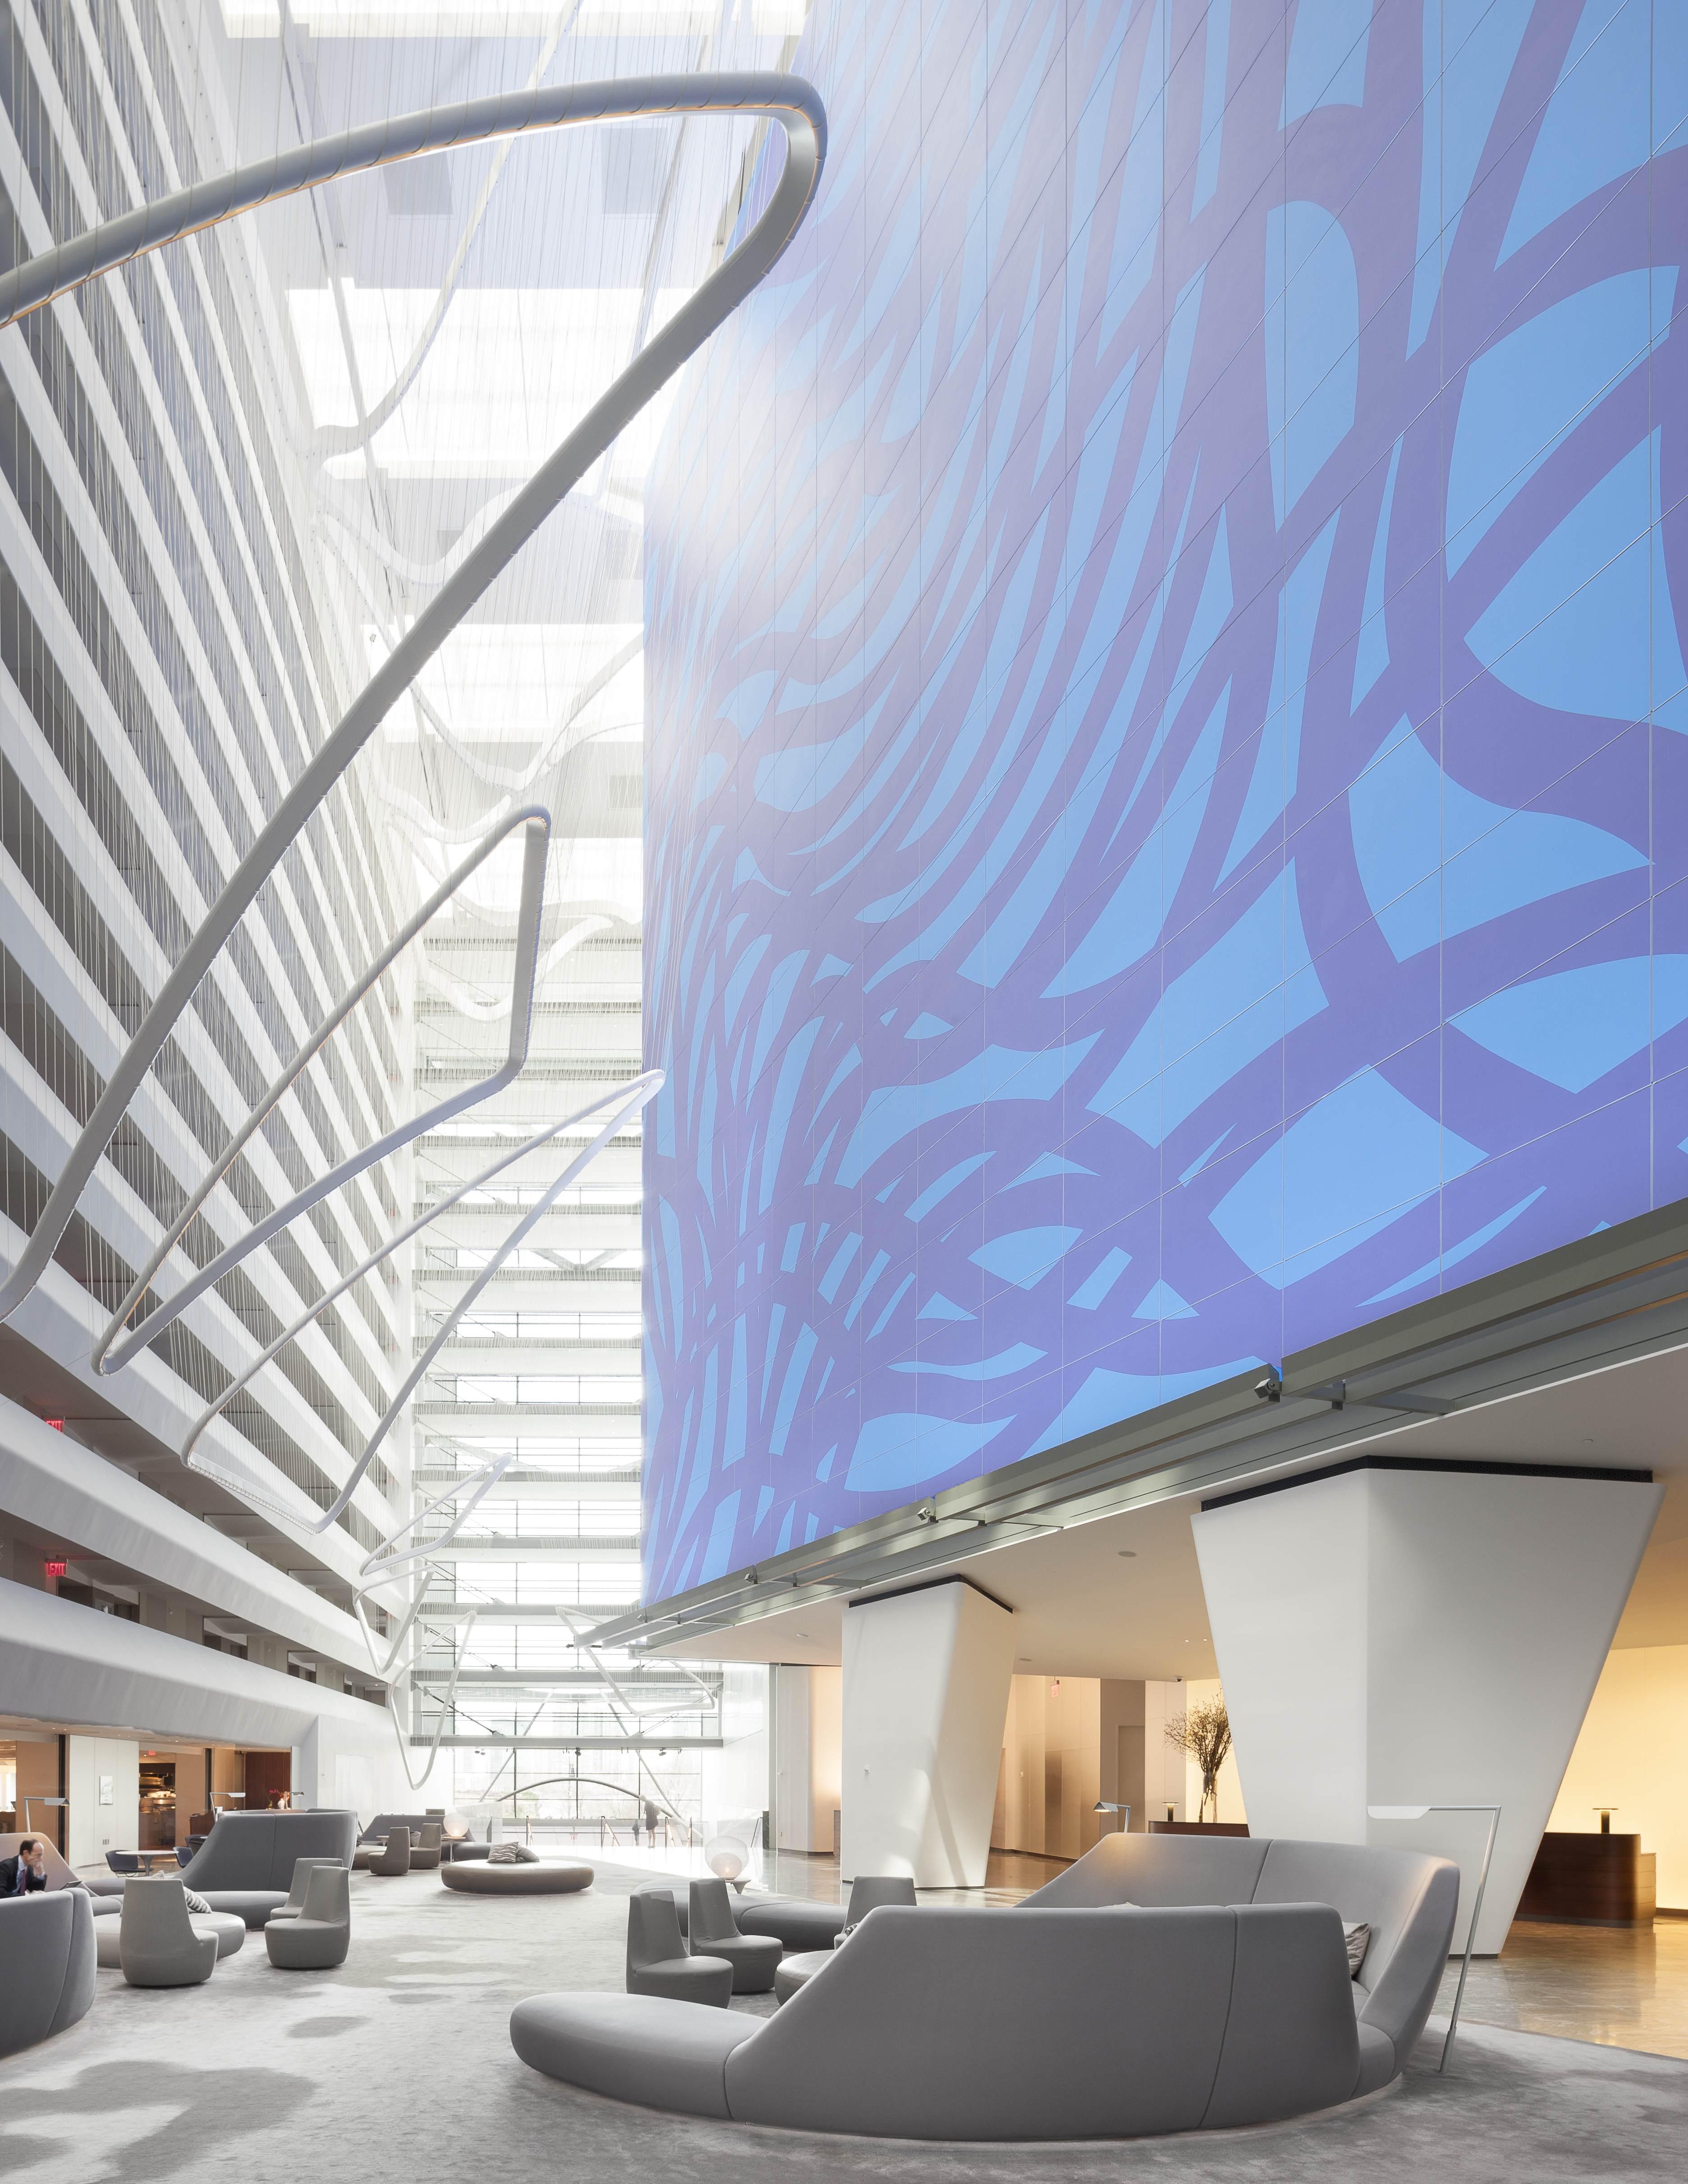 Wallpaper design awards best new restaurant interior design magazine best of year award formal dining boston society of architects iida asid